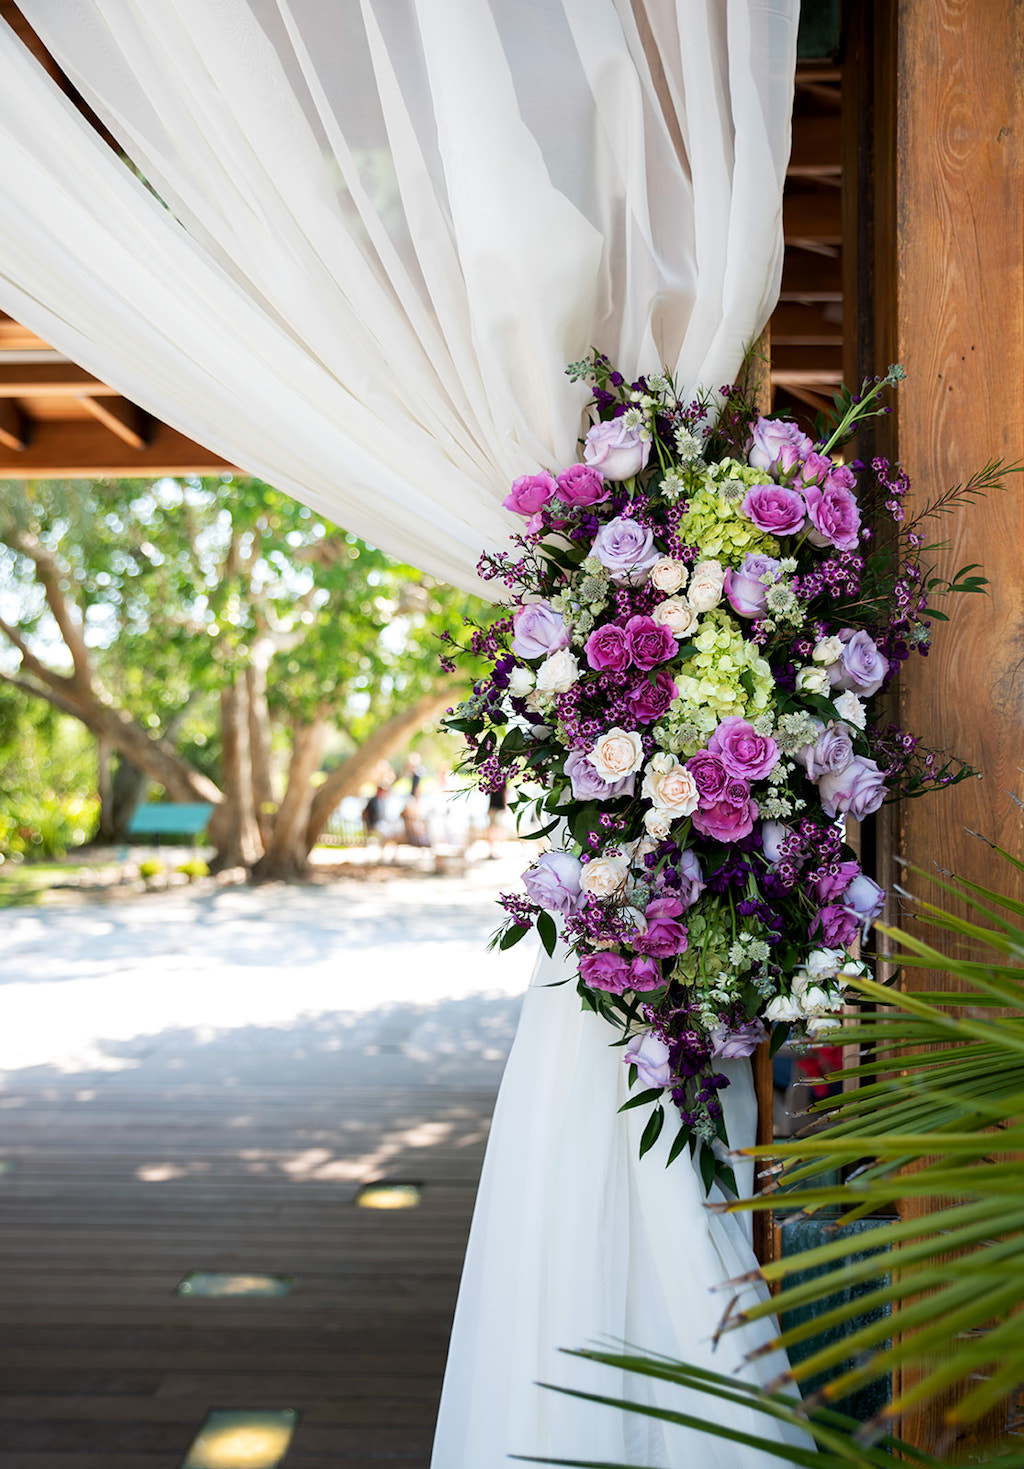 Sarasota Elegant, Classic Wedding Ceremony Decor, White Draping, Purple, Lilac Roses, Green Hydrangeas, Blush Pink and Greenery Floral Arrangement